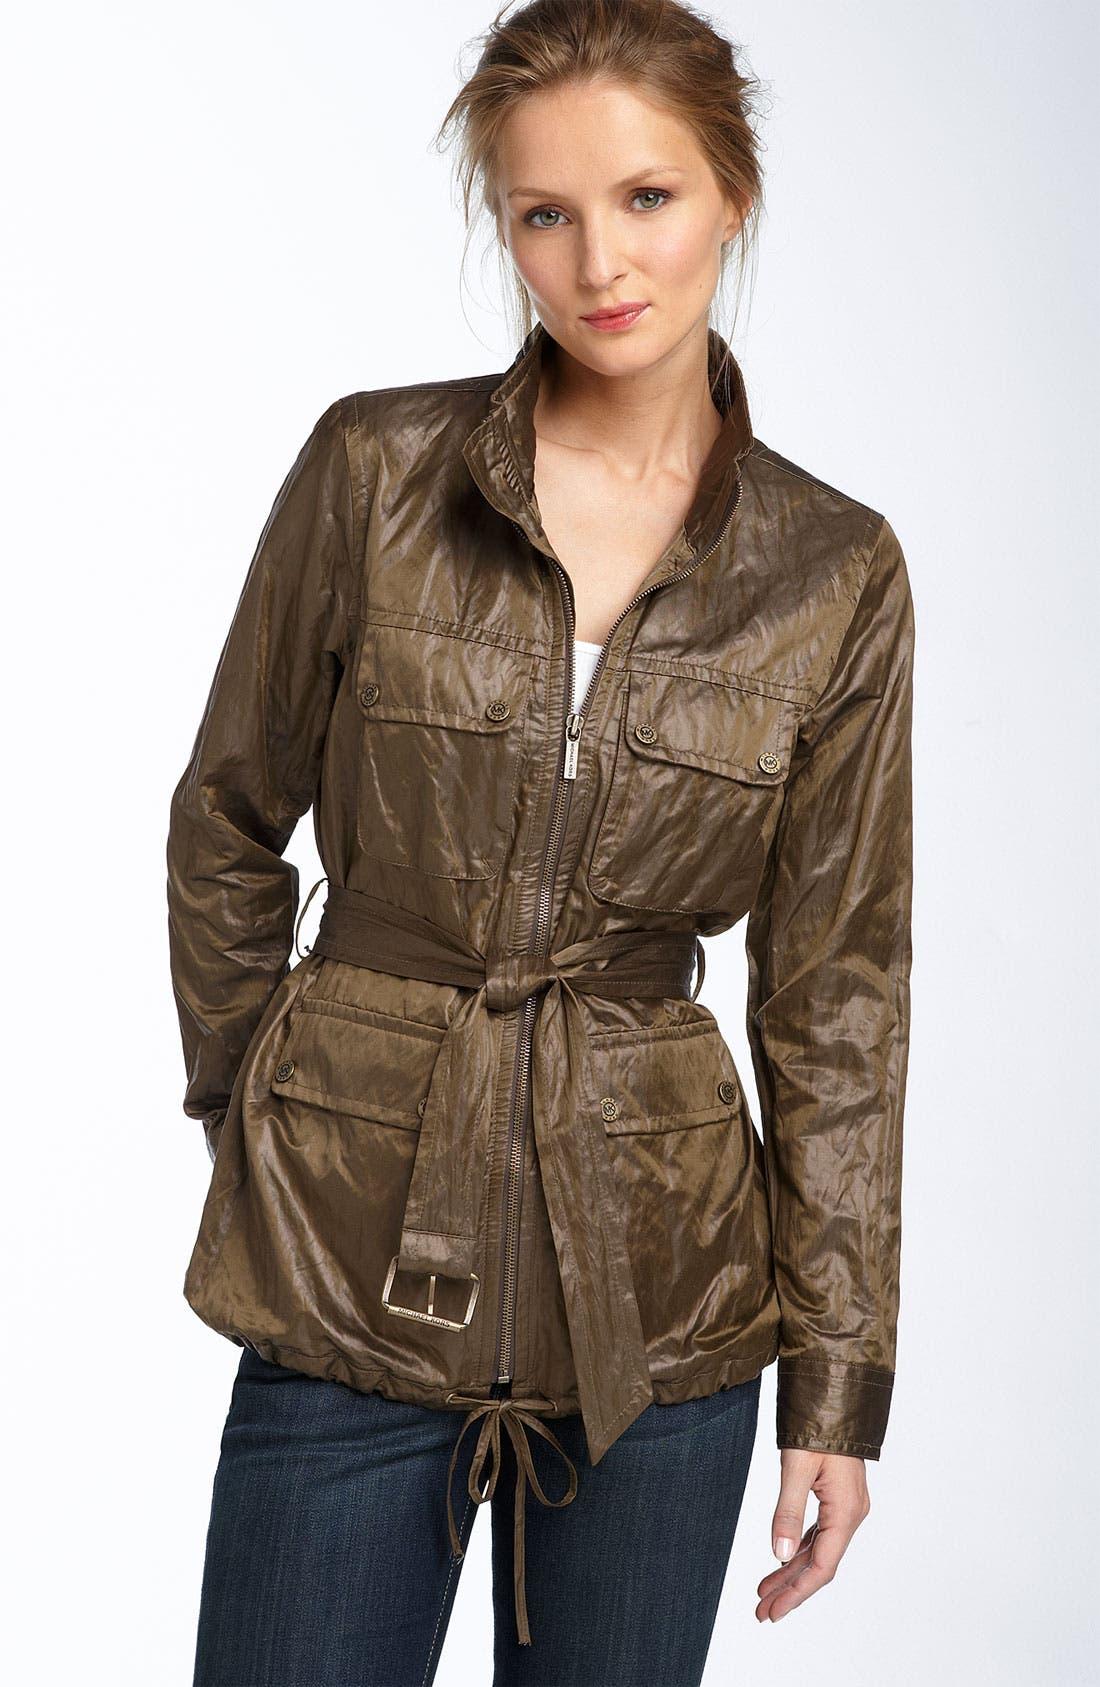 Alternate Image 1 Selected - MICHAEL Michael Kors Belted Military Jacket